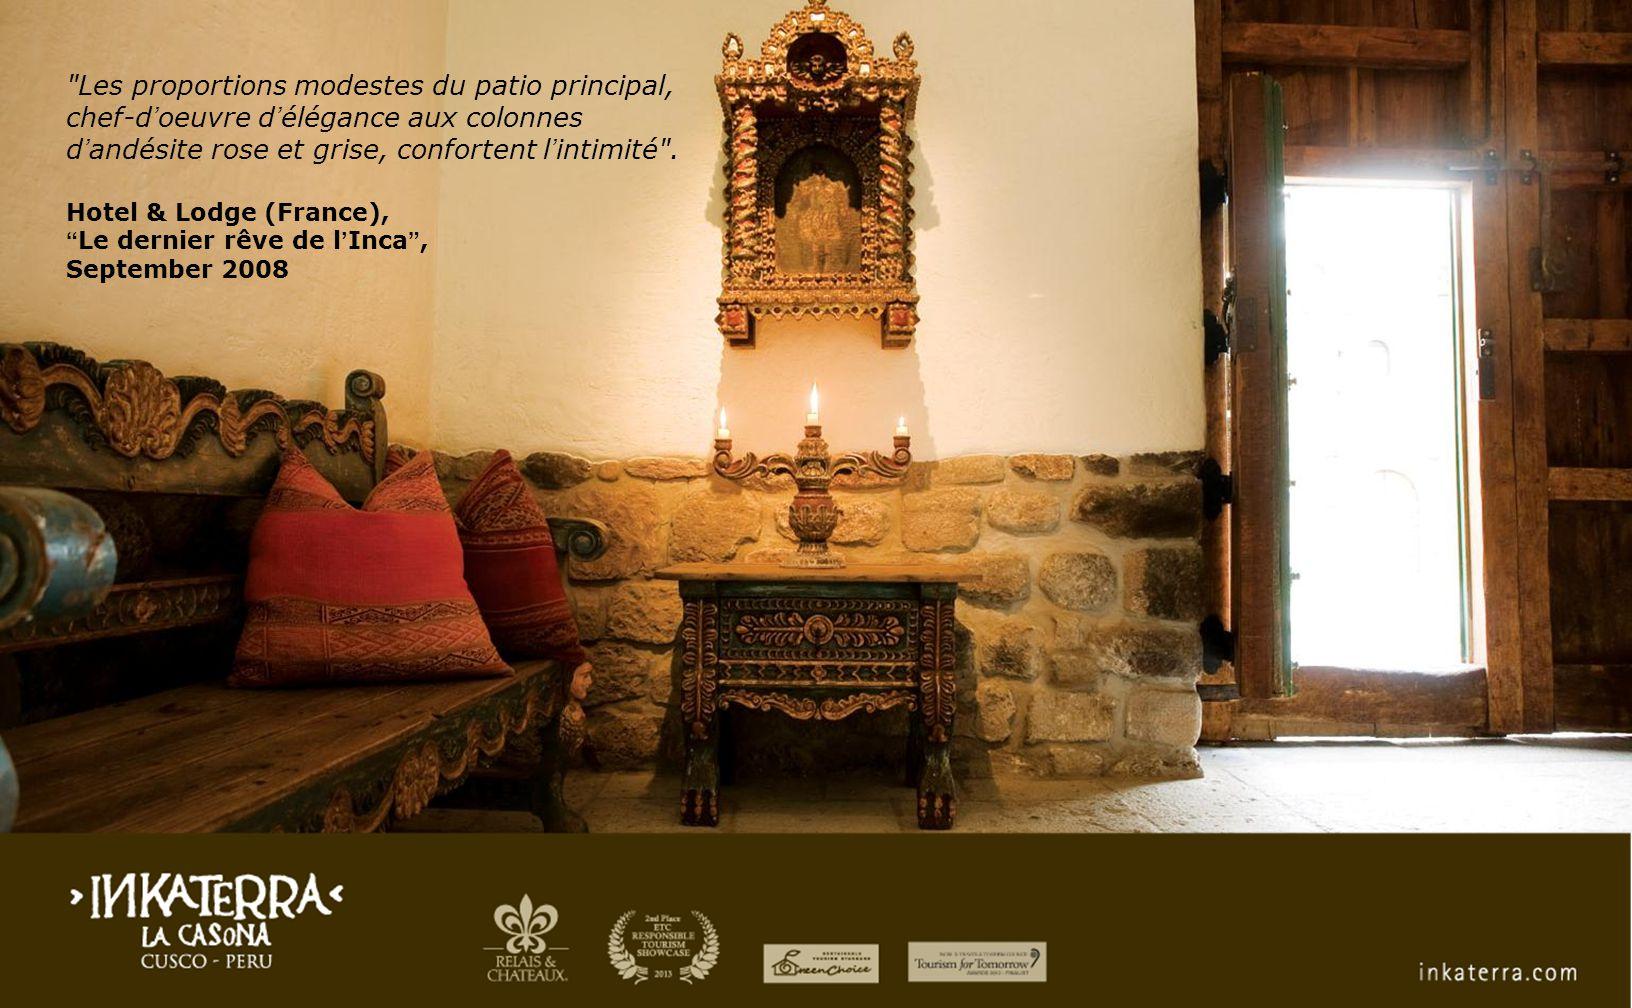 World's Best Hotels 2011 - Best Ambiance & Design Best of the Americas & Caribbean Condé Nast Traveller U.K January 2011